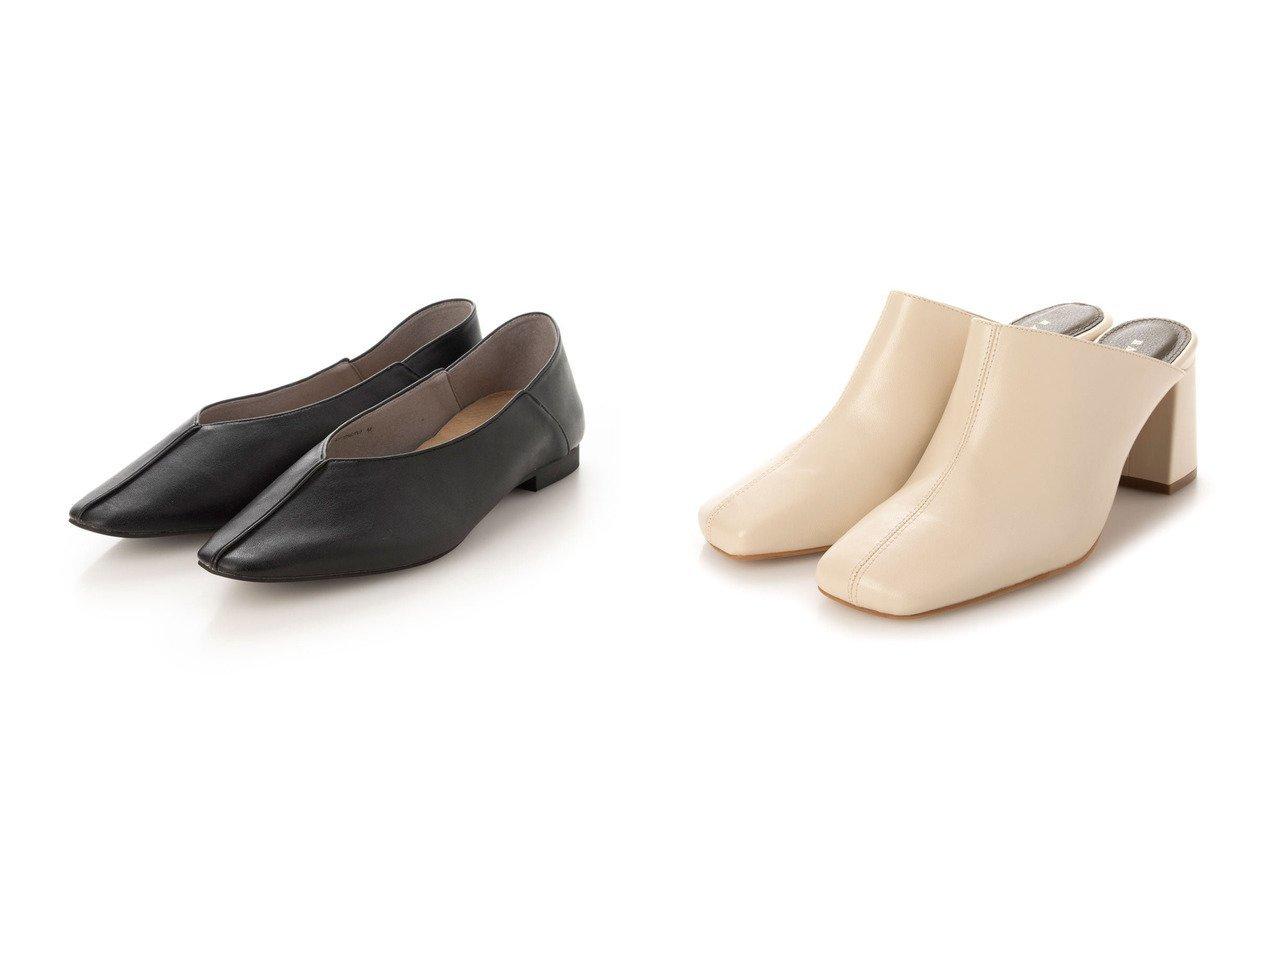 【RANDA/ランダ】のストレスフリー/ソフト Vカットバブーシュ&ソフト ワイドスクエアトゥミュールパンプス おすすめ!人気、トレンド・レディースファッションの通販 おすすめで人気の流行・トレンド、ファッションの通販商品 インテリア・家具・メンズファッション・キッズファッション・レディースファッション・服の通販 founy(ファニー) https://founy.com/ ファッション Fashion レディースファッション WOMEN 2021年 2021 2021-2022秋冬・A/W AW・Autumn/Winter・FW・Fall-Winter・2021-2022 A/W・秋冬 AW・Autumn/Winter・FW・Fall-Winter トレンド クッション シューズ センター フラット |ID:crp329100000062479